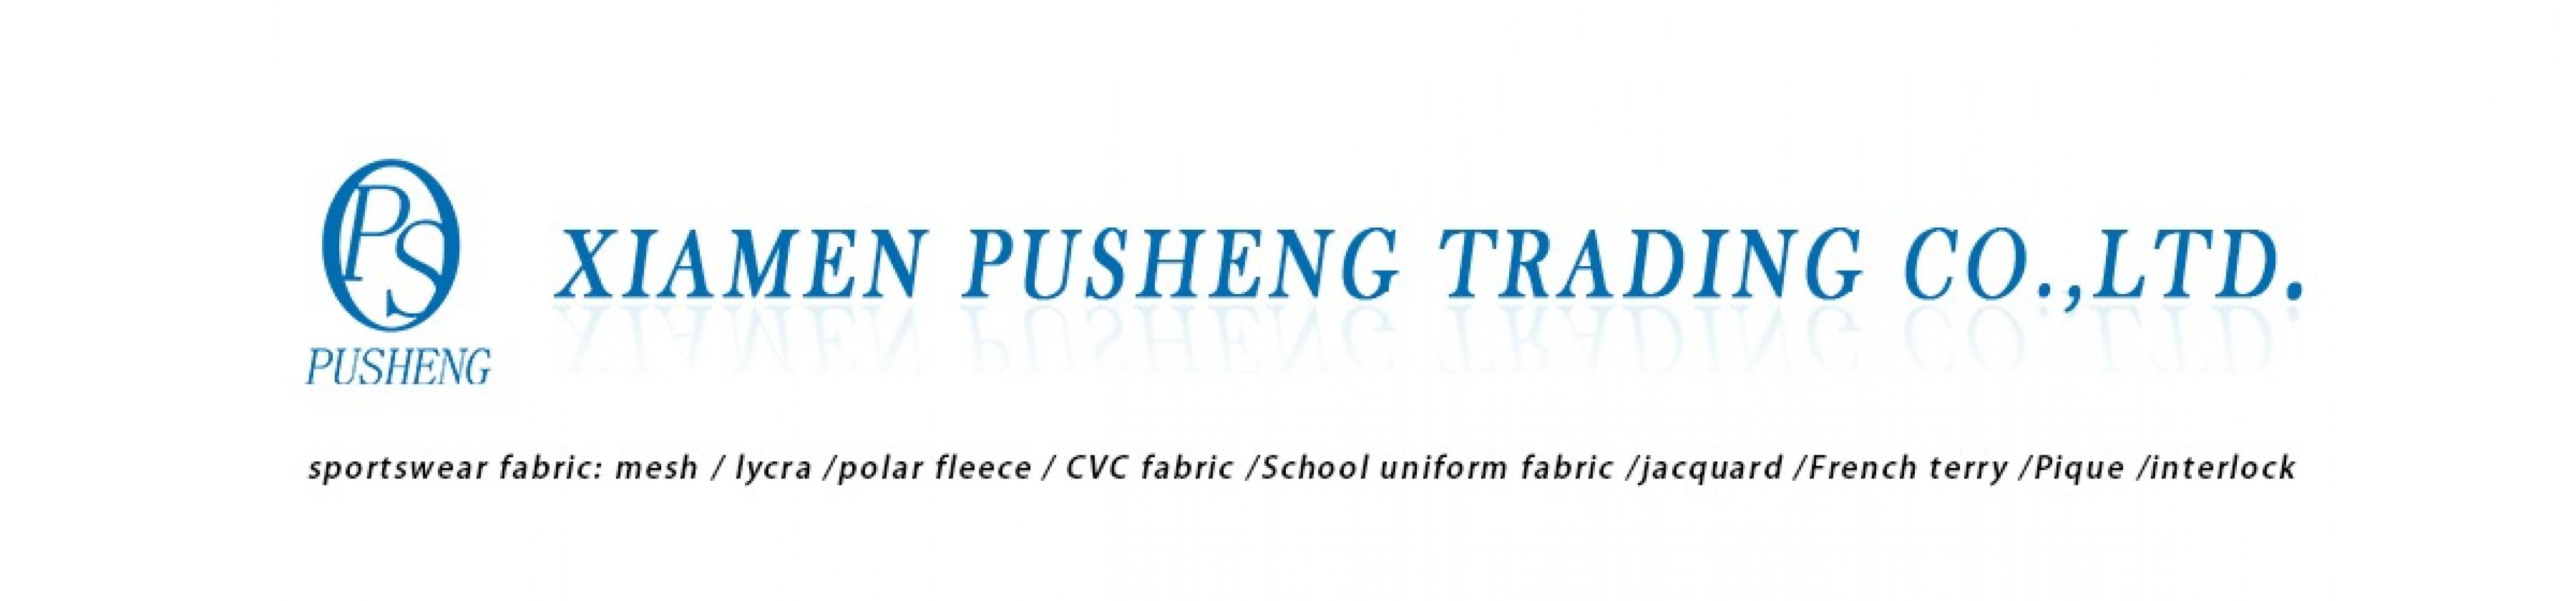 XIMEN PUSHENG TRADING CO., LTD.